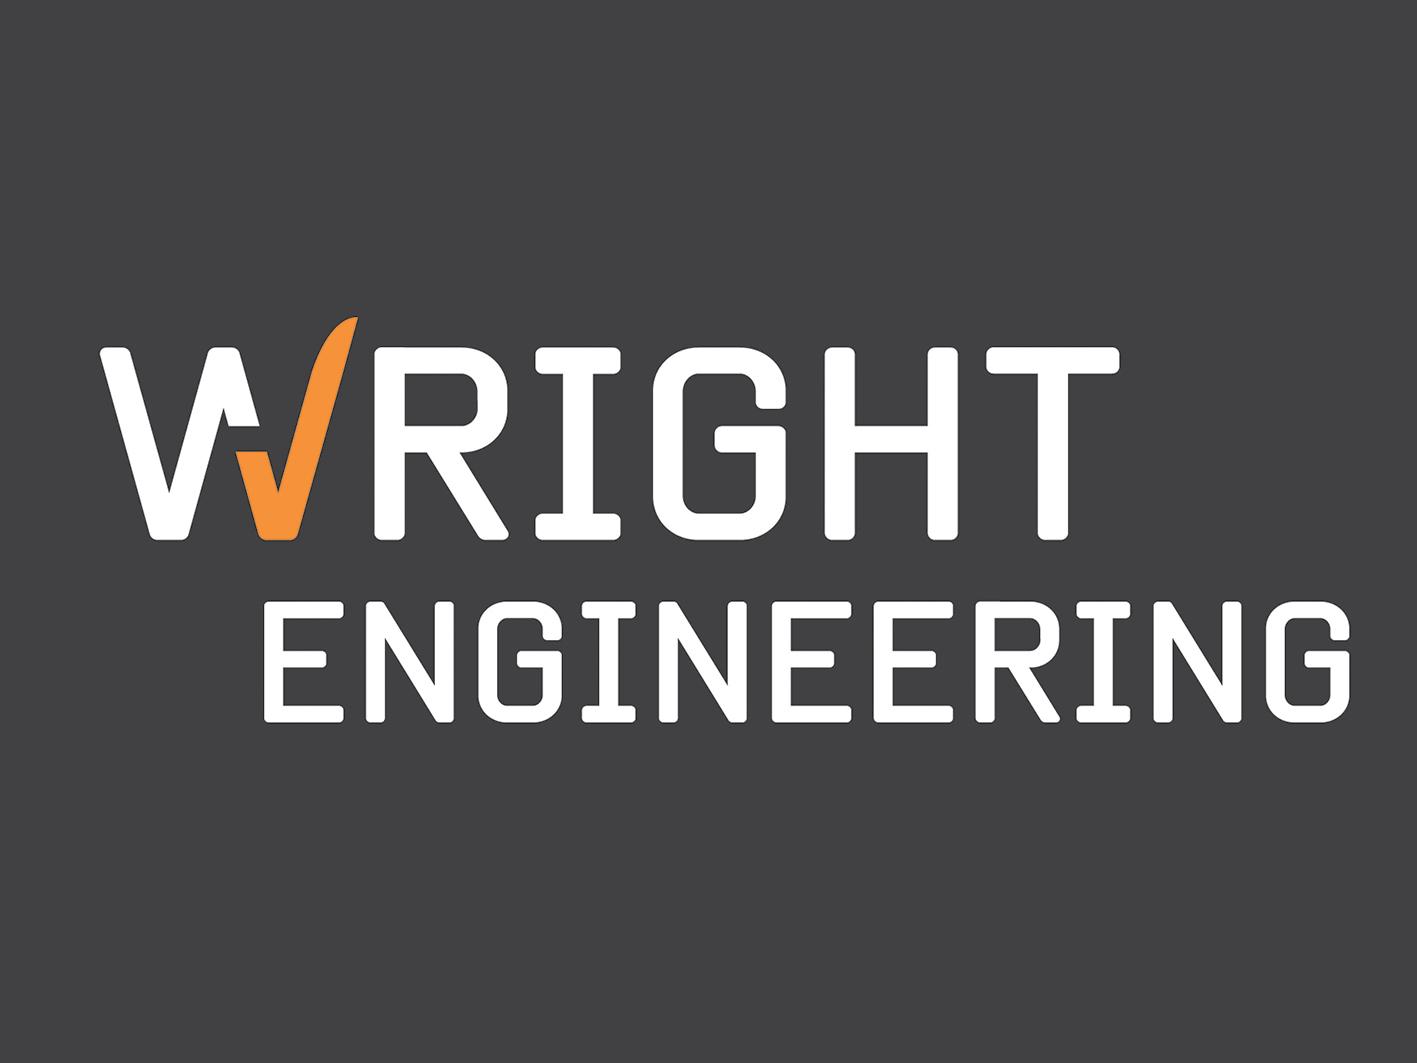 Wright-Engineering-branding-logo-thumbnail.jpg